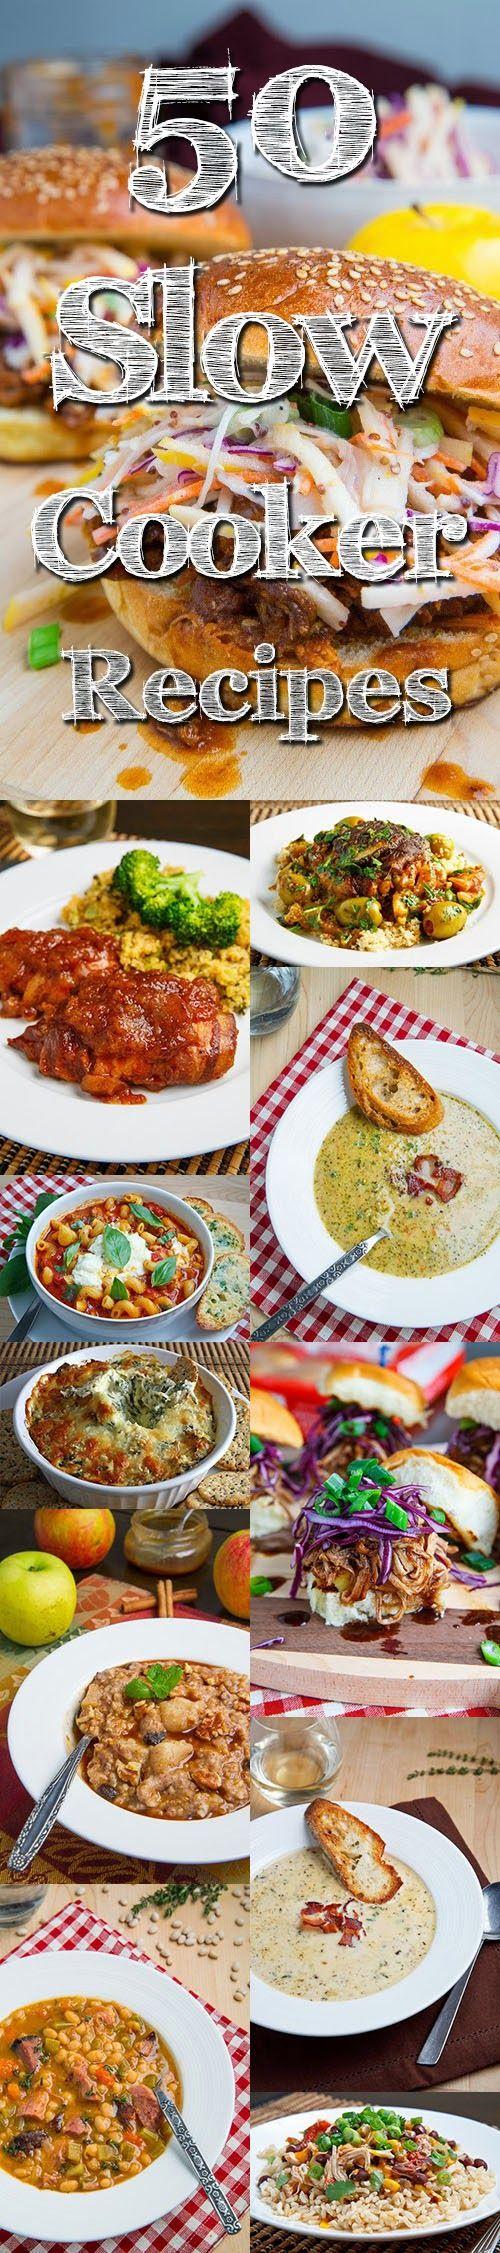 Slow Cooker Recipes - Closet Cooking